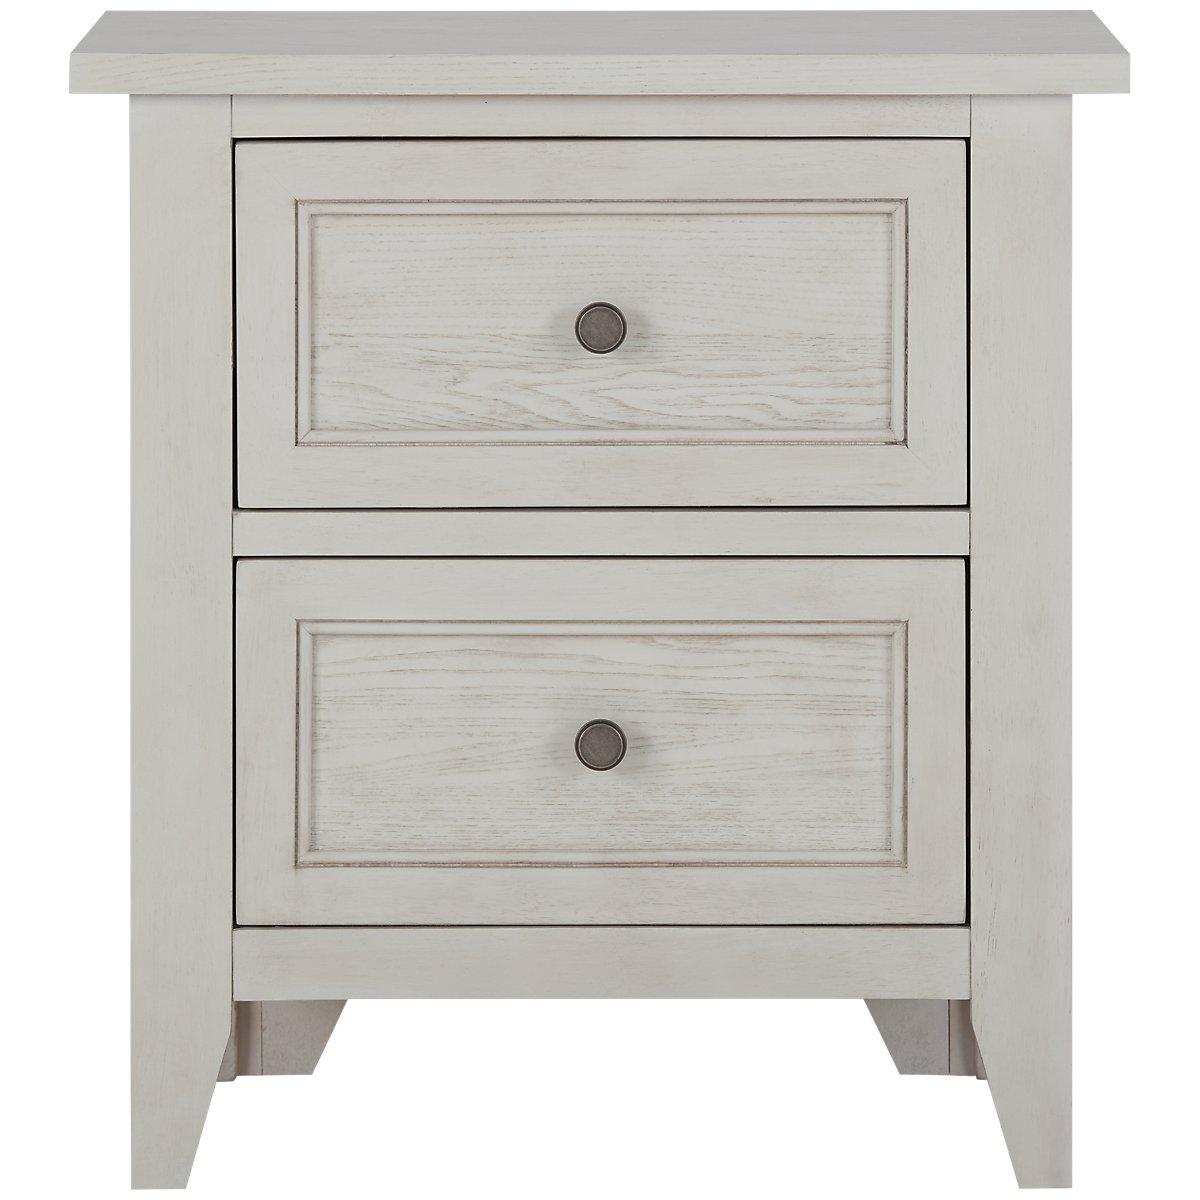 Dawson Ivory Wood Drawer Nightstand